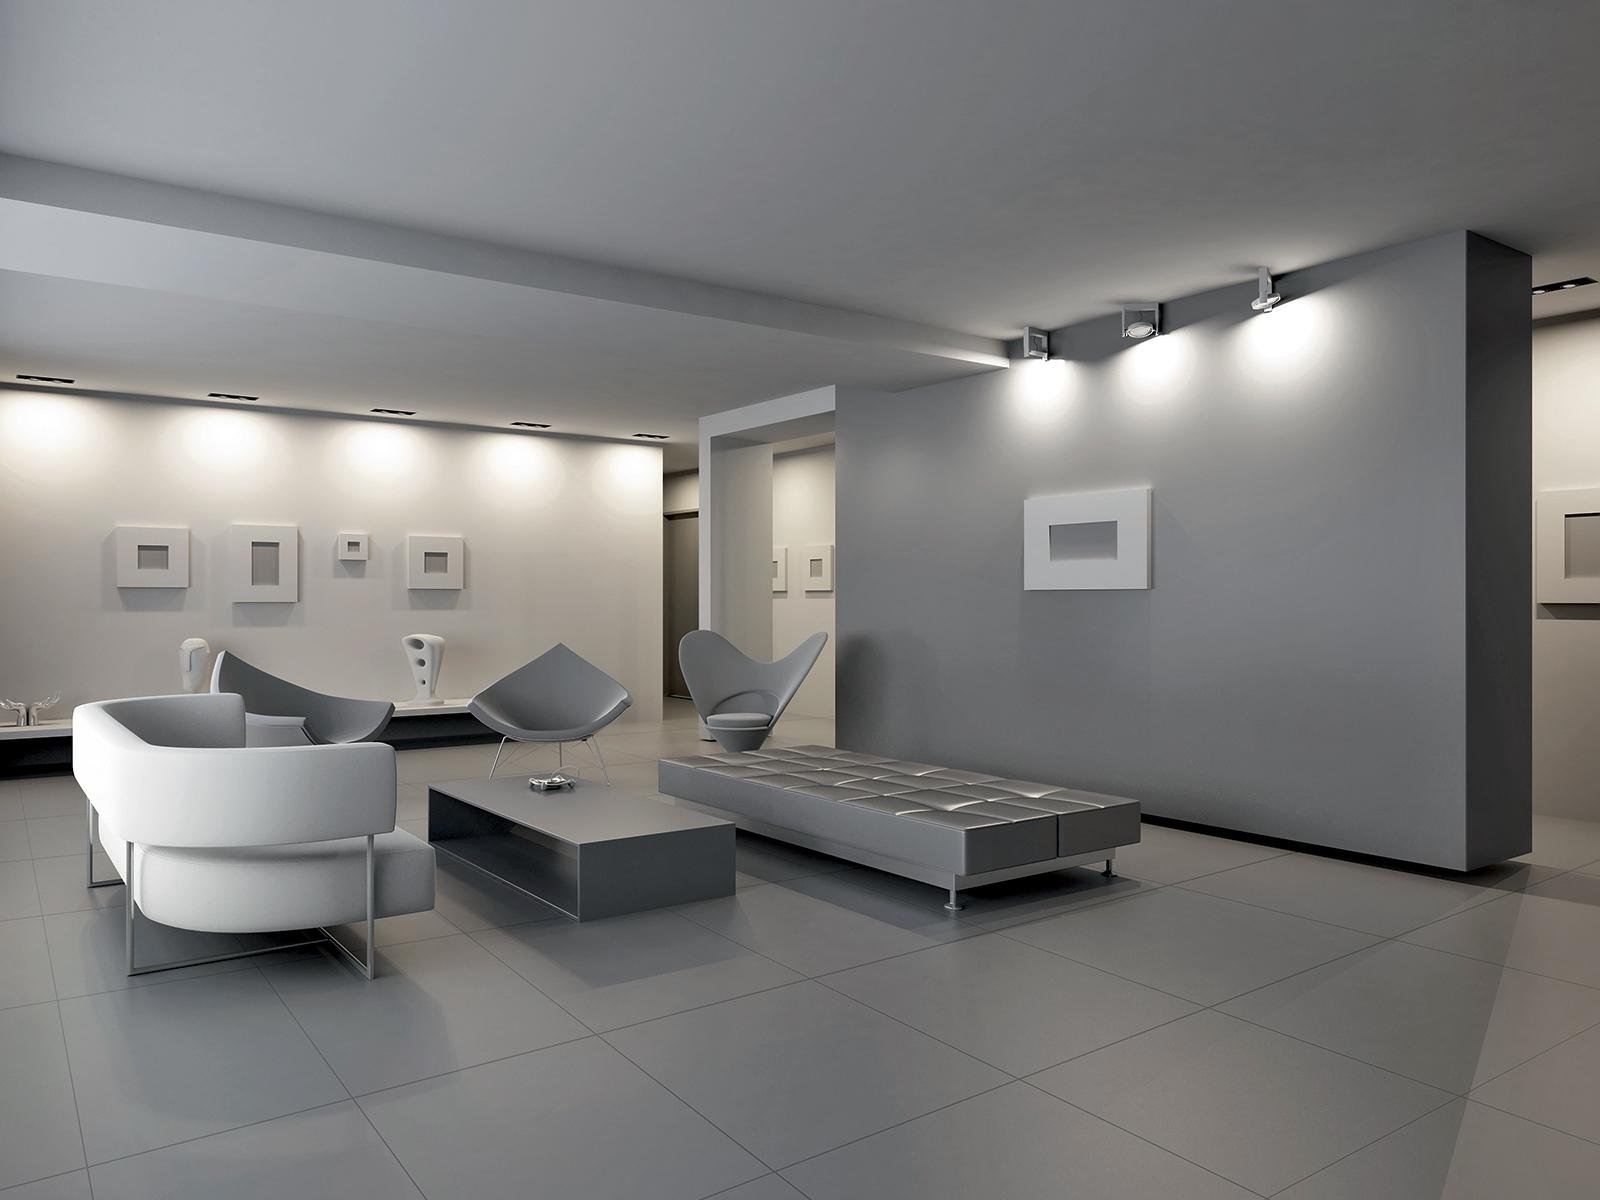 Pavimento Bianco E Grigio : Serie urano pavimenti e rivestimenti armonie by arte casa